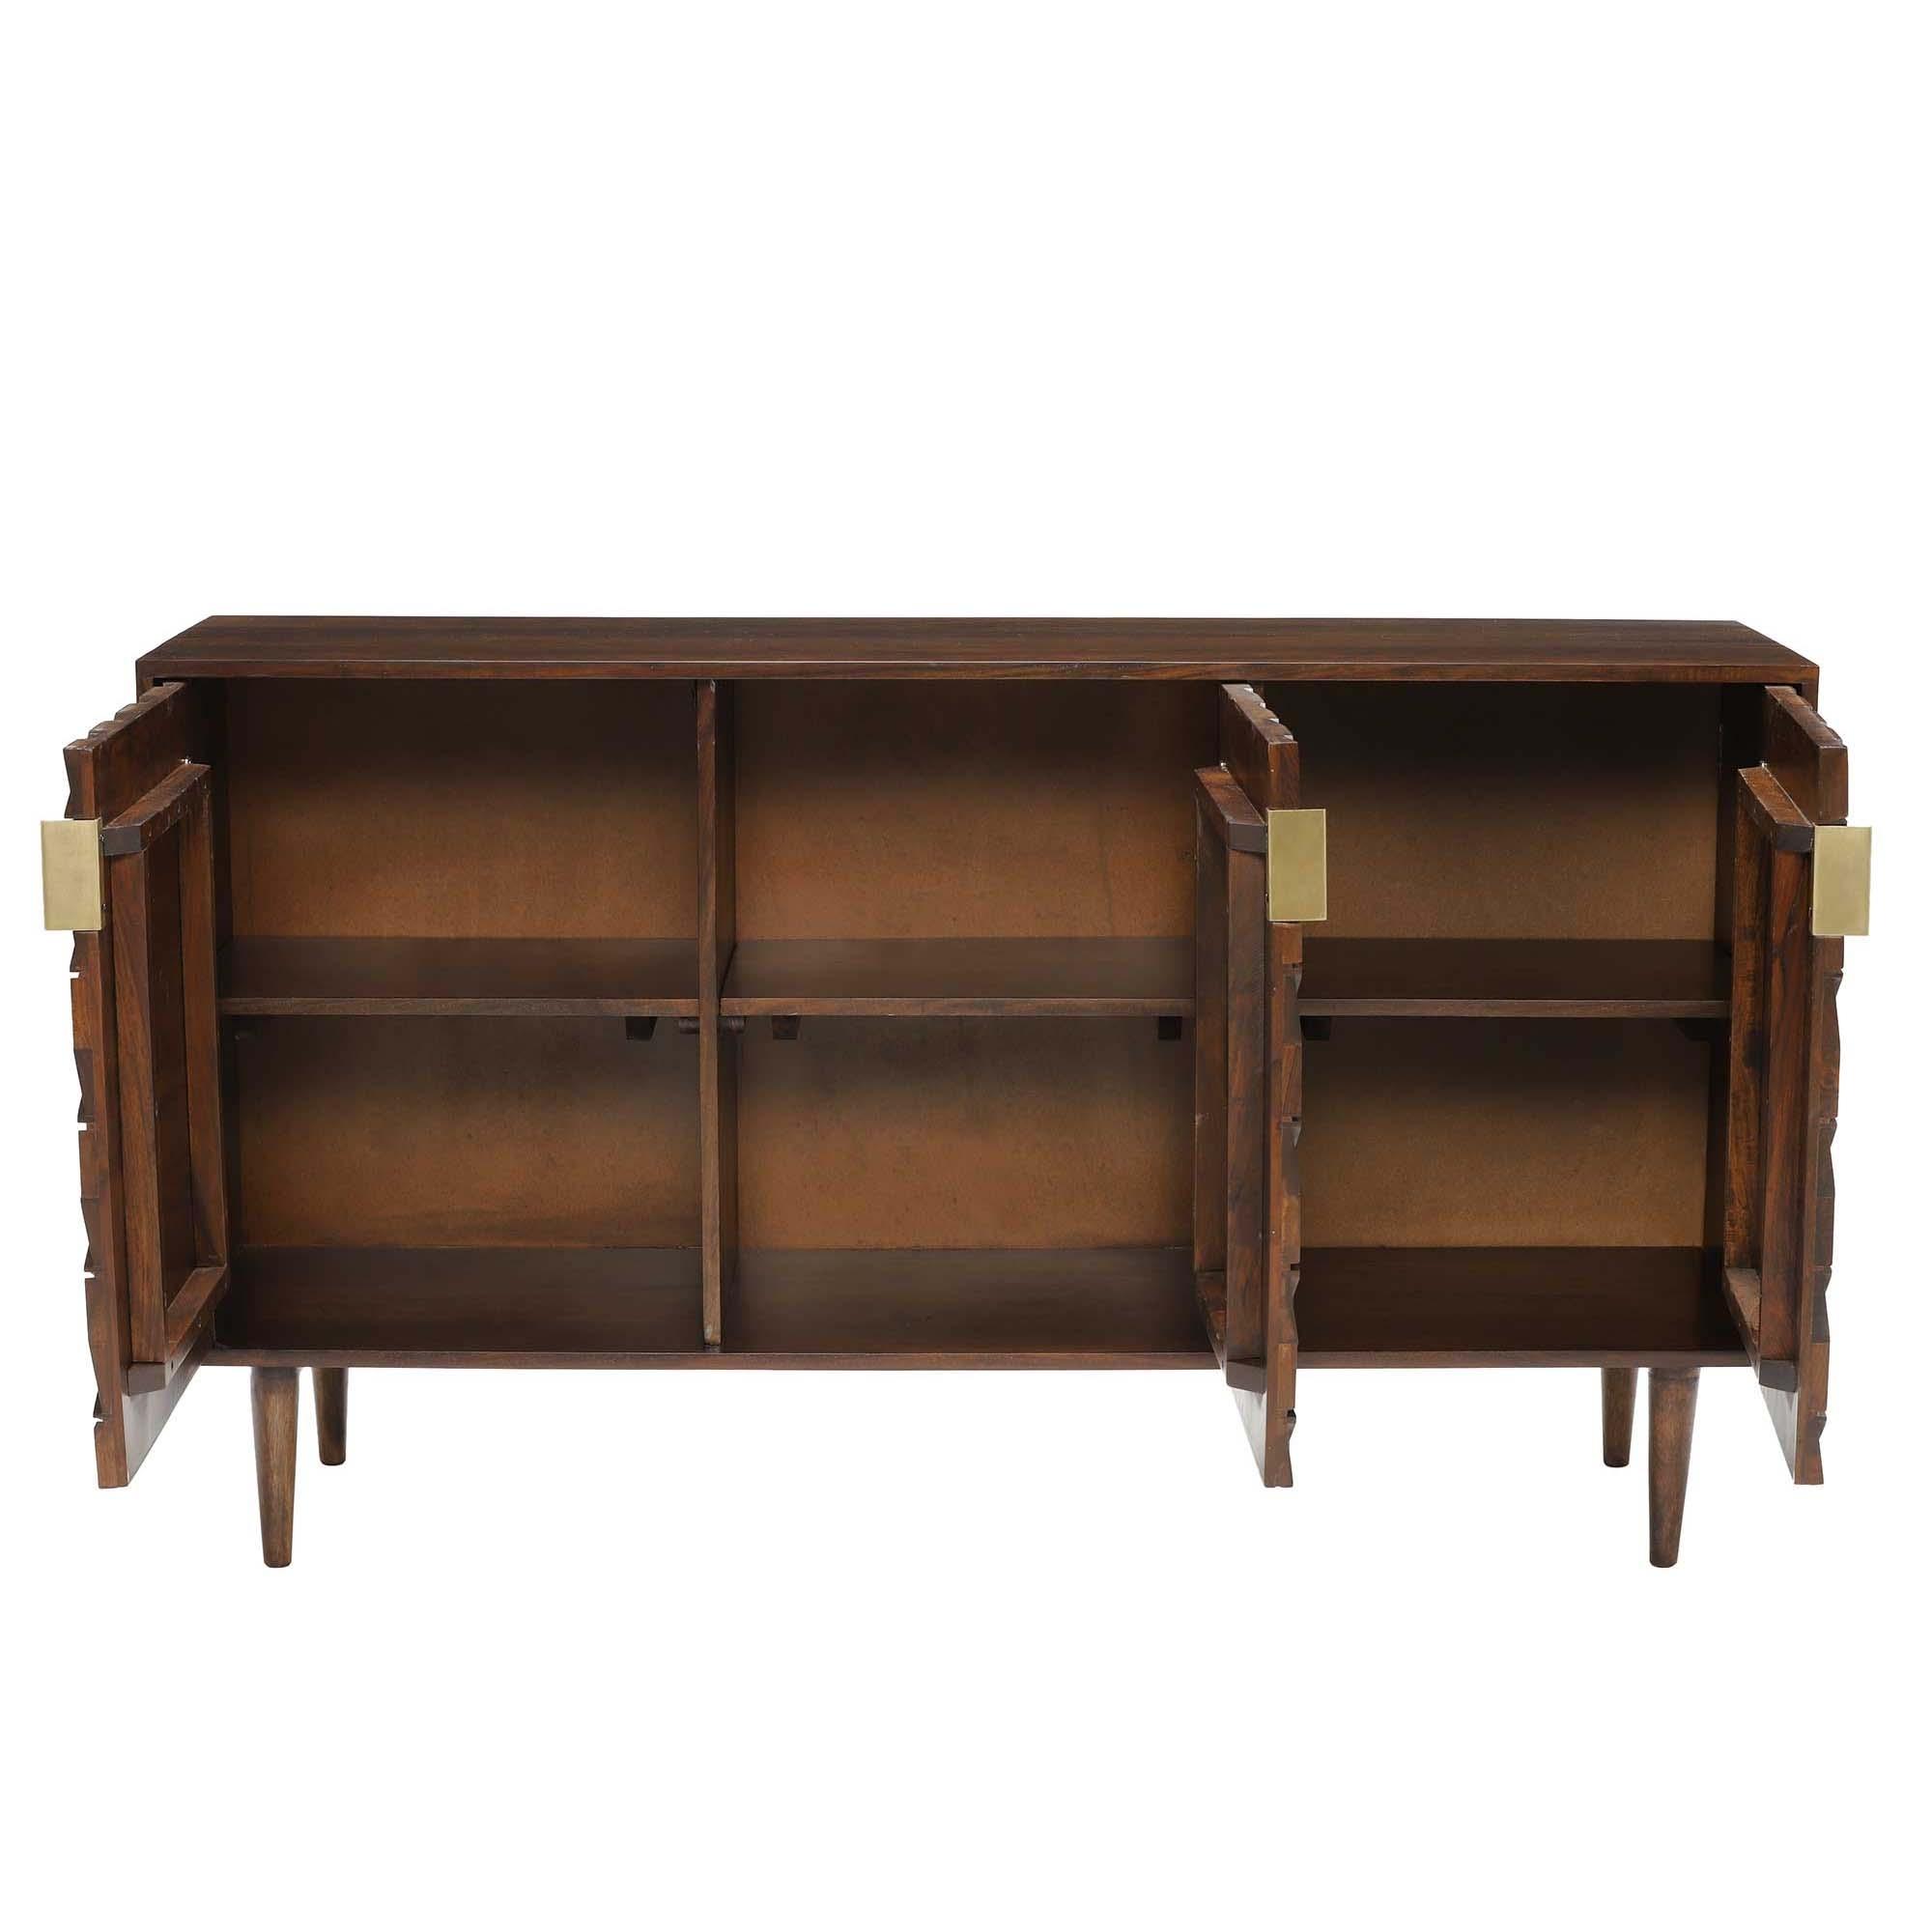 Kiro 3 Door Sideboard, American Walnut | Sideboards | Dining Room with Walnut Finish 2-Door/3-Drawer Sideboards (Image 15 of 30)